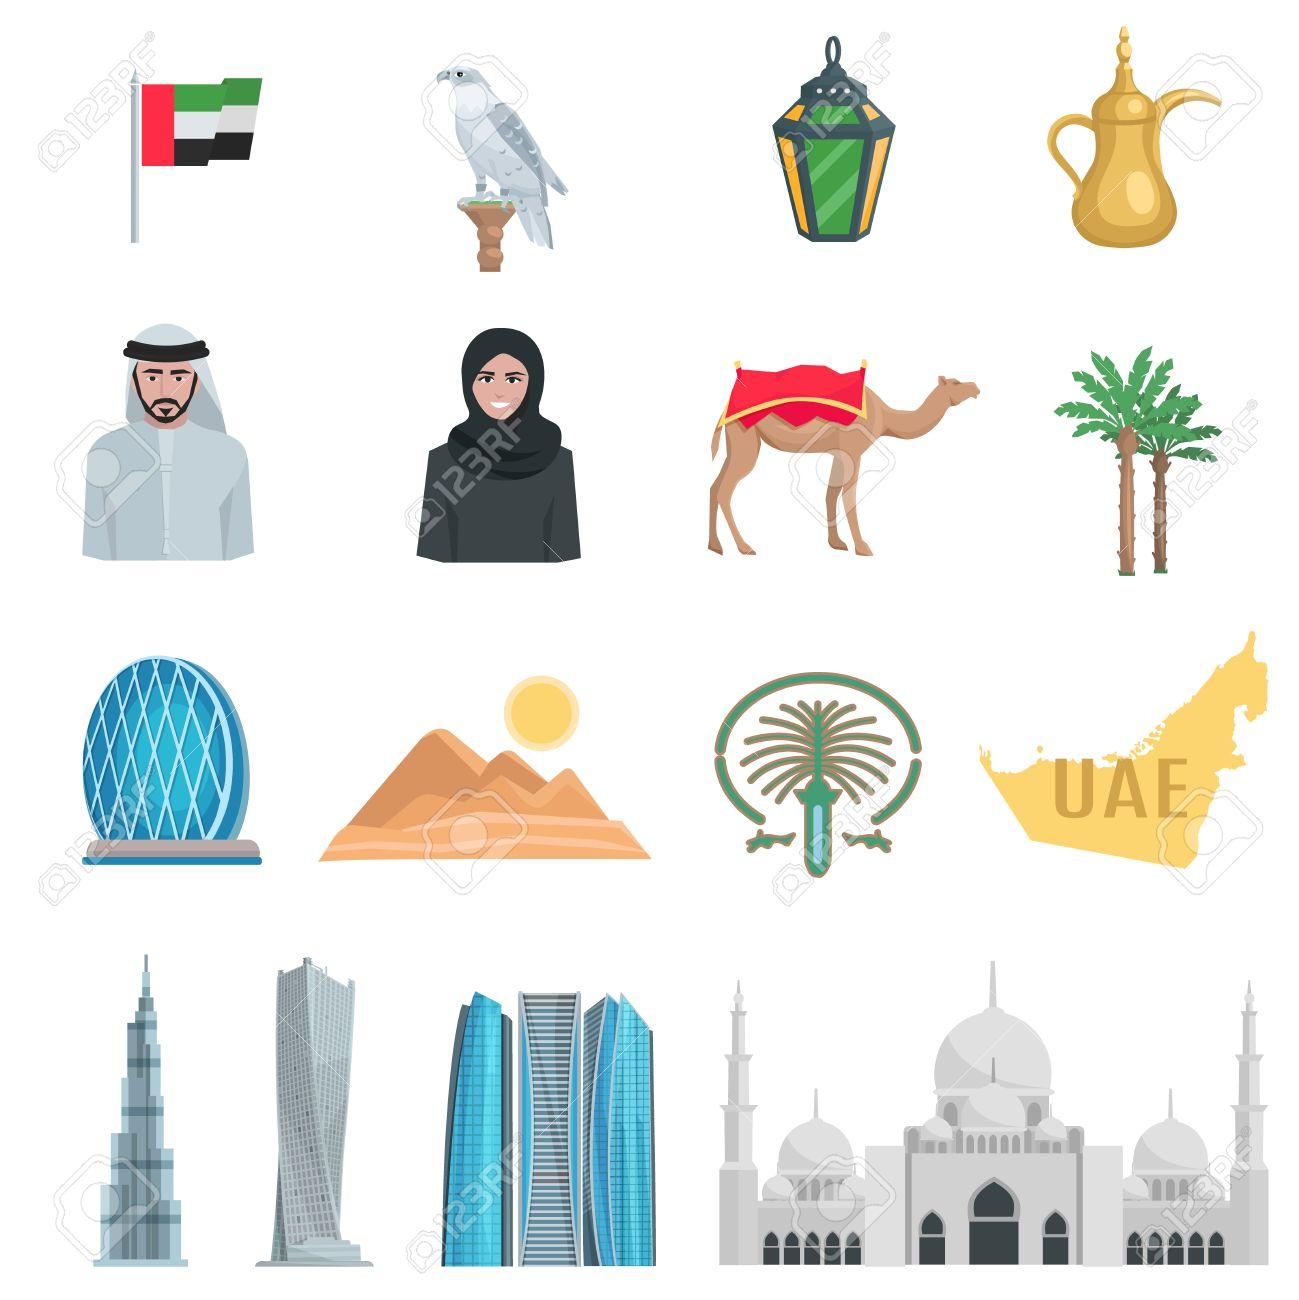 United arab emirates flat icons with symbols of state and cultural united arab emirates flat icons with symbols of state and cultural objects isolated vector illustration stock biocorpaavc Images